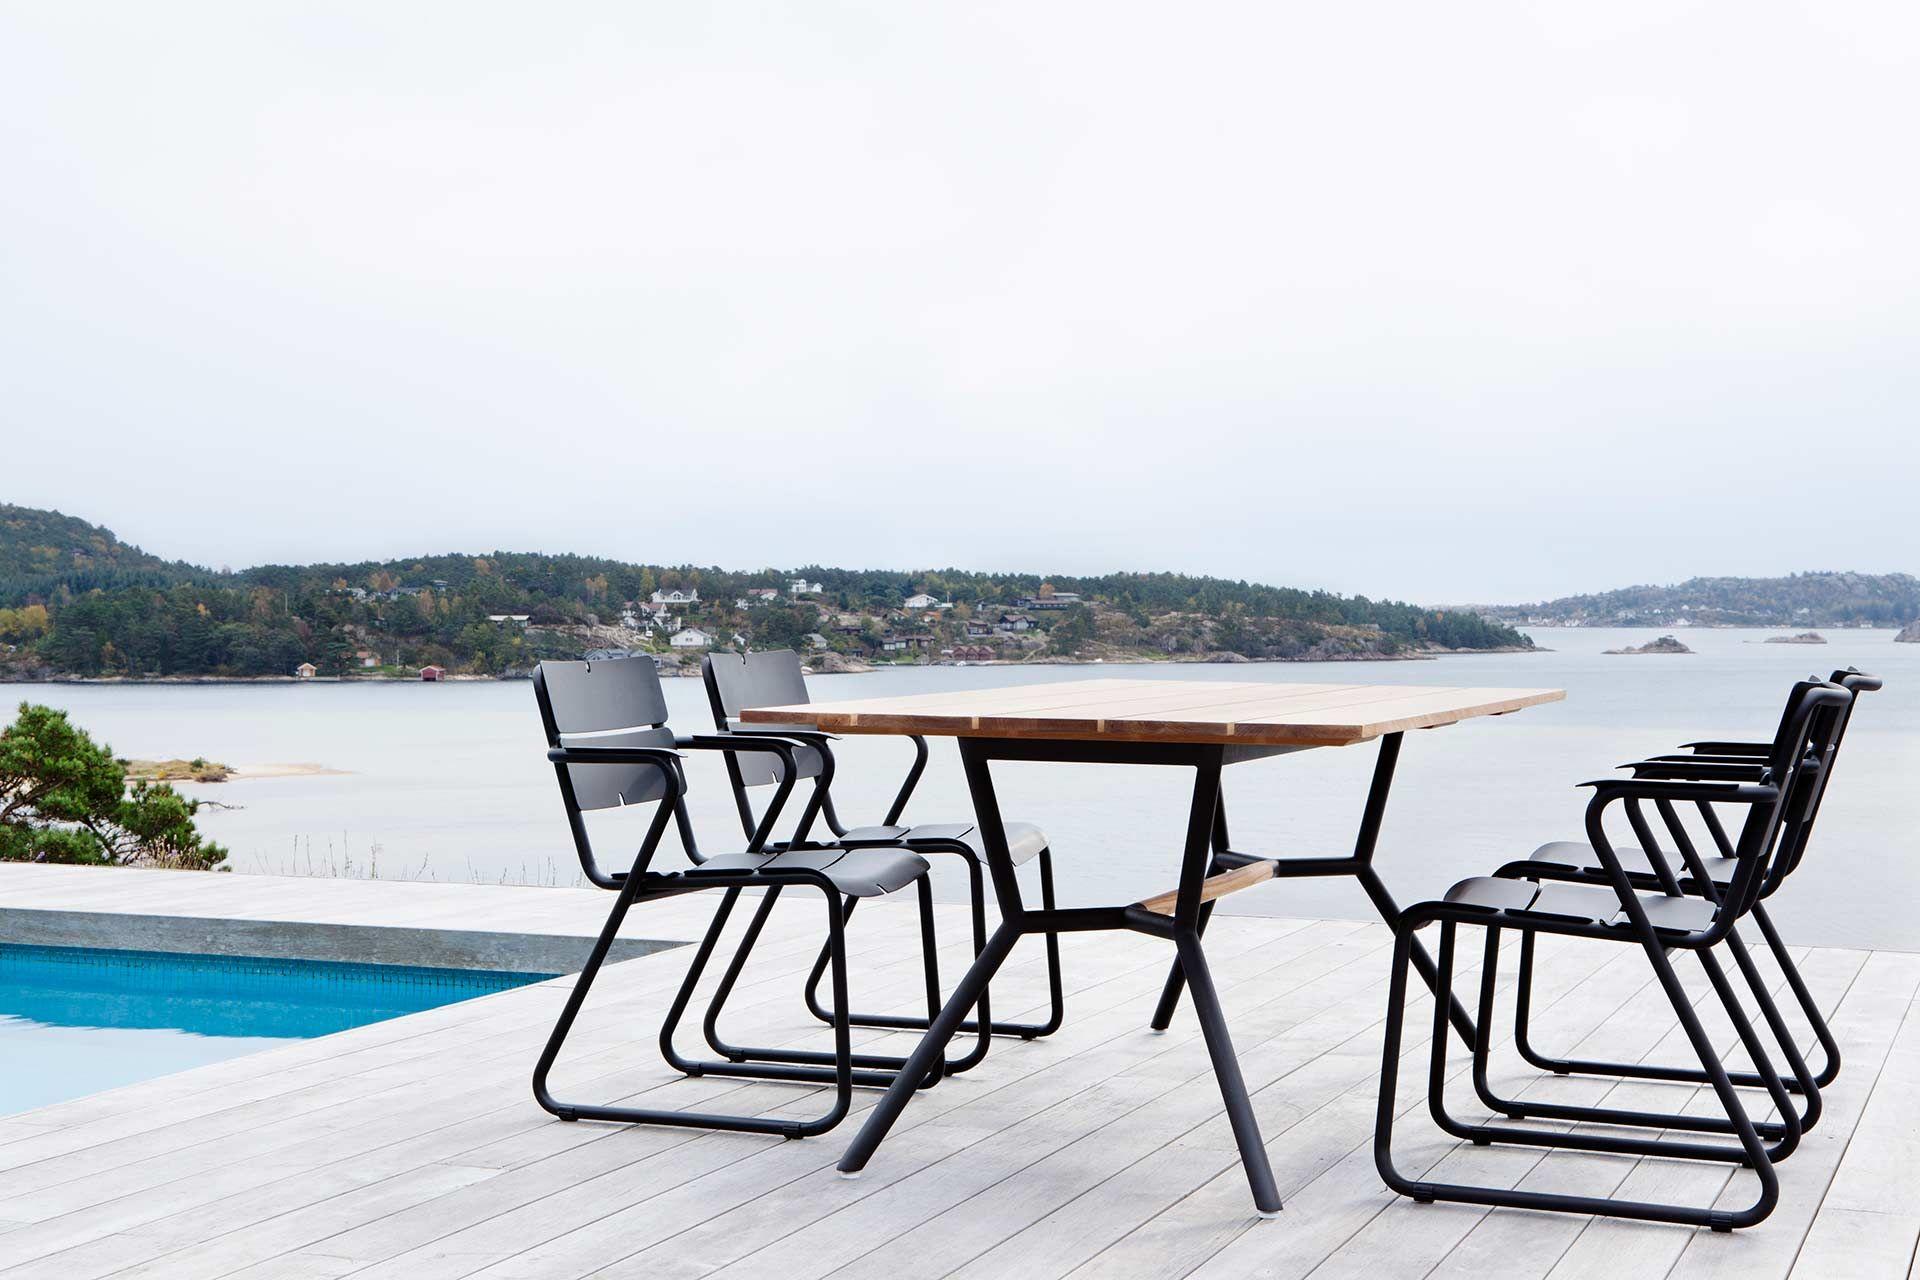 Charmant Fesselnd Oslo Chair Minimalist Alu Gartensthle Simple Deluxe Alu Stuhl  Extrabreit Klappstuhl Entzuckend Best Stapelsessel Antigua Alu Guss Bronze  ...